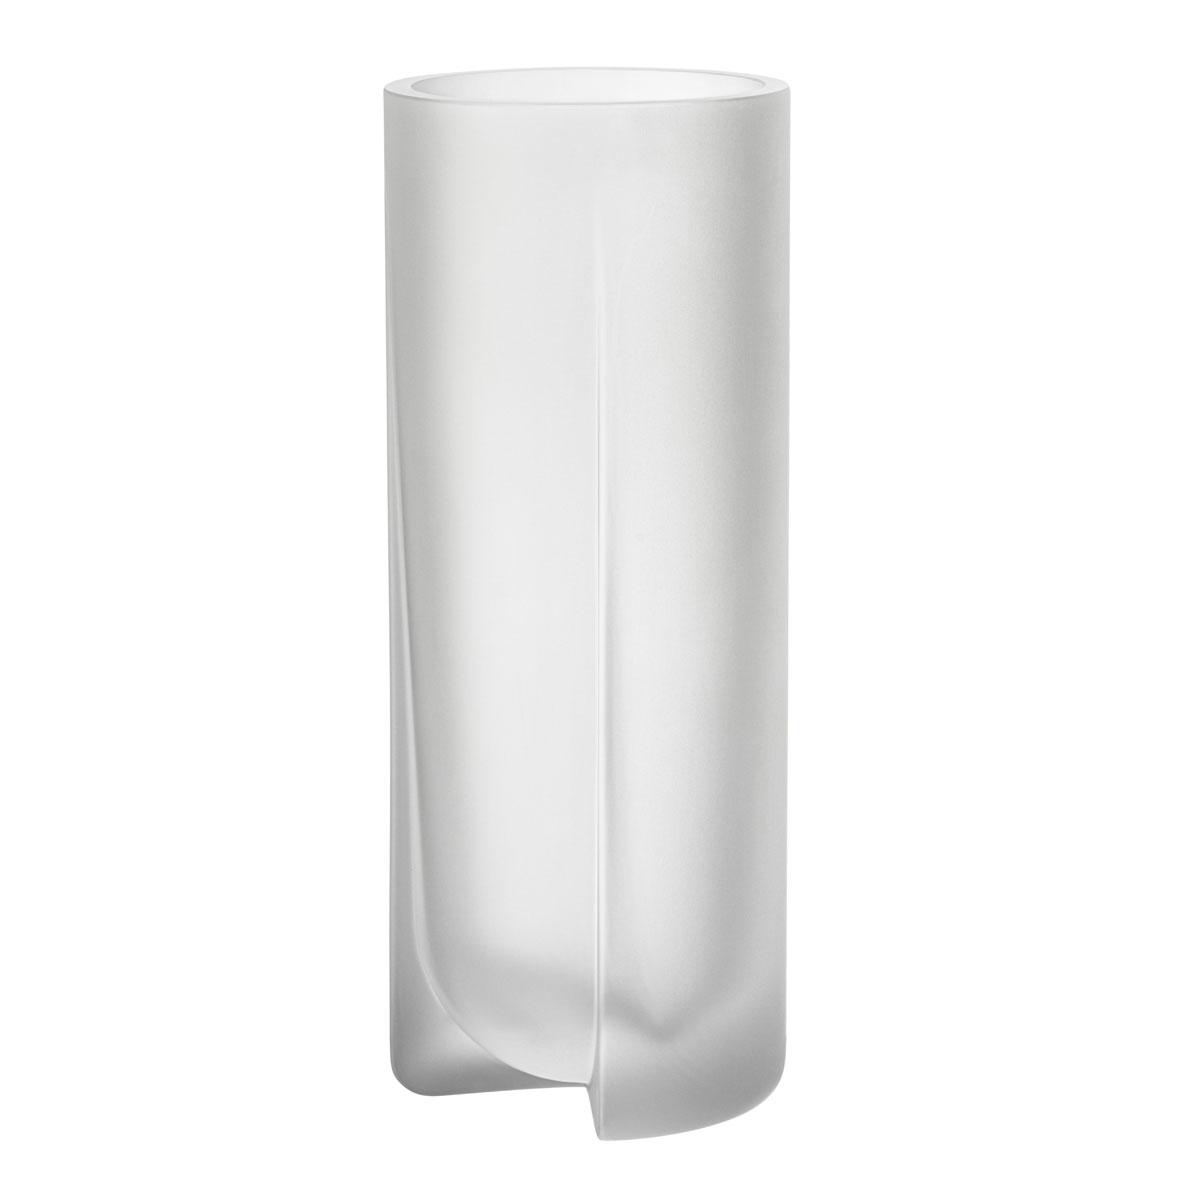 "Iittala Kuru Vase 10"" Frosted Clear"